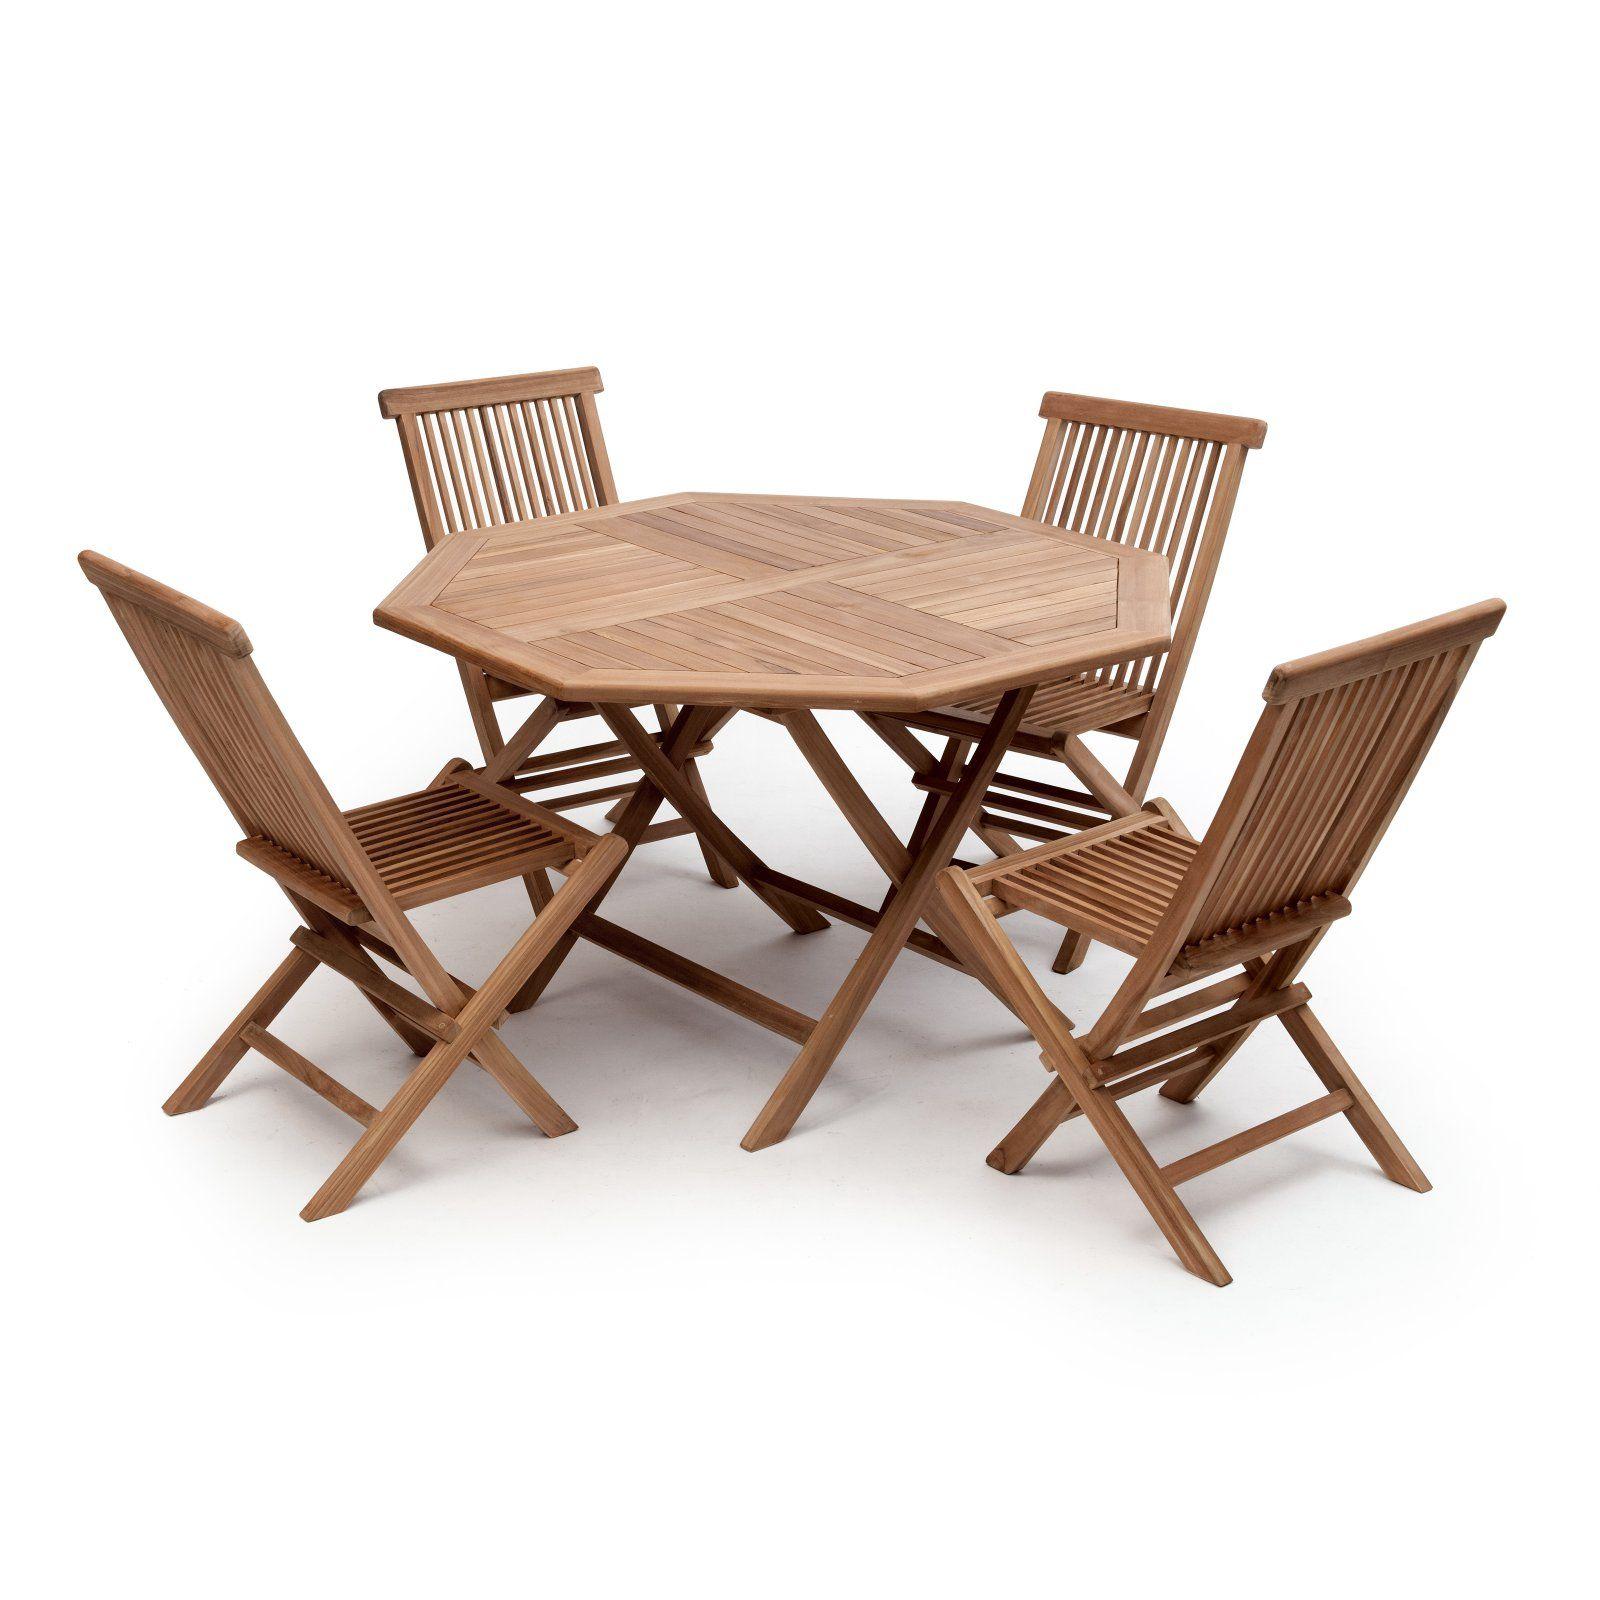 40473dcaf7 Suntime Outdoor Living Bali Octagonal Folding Teak 5 Piece Patio Dining Set